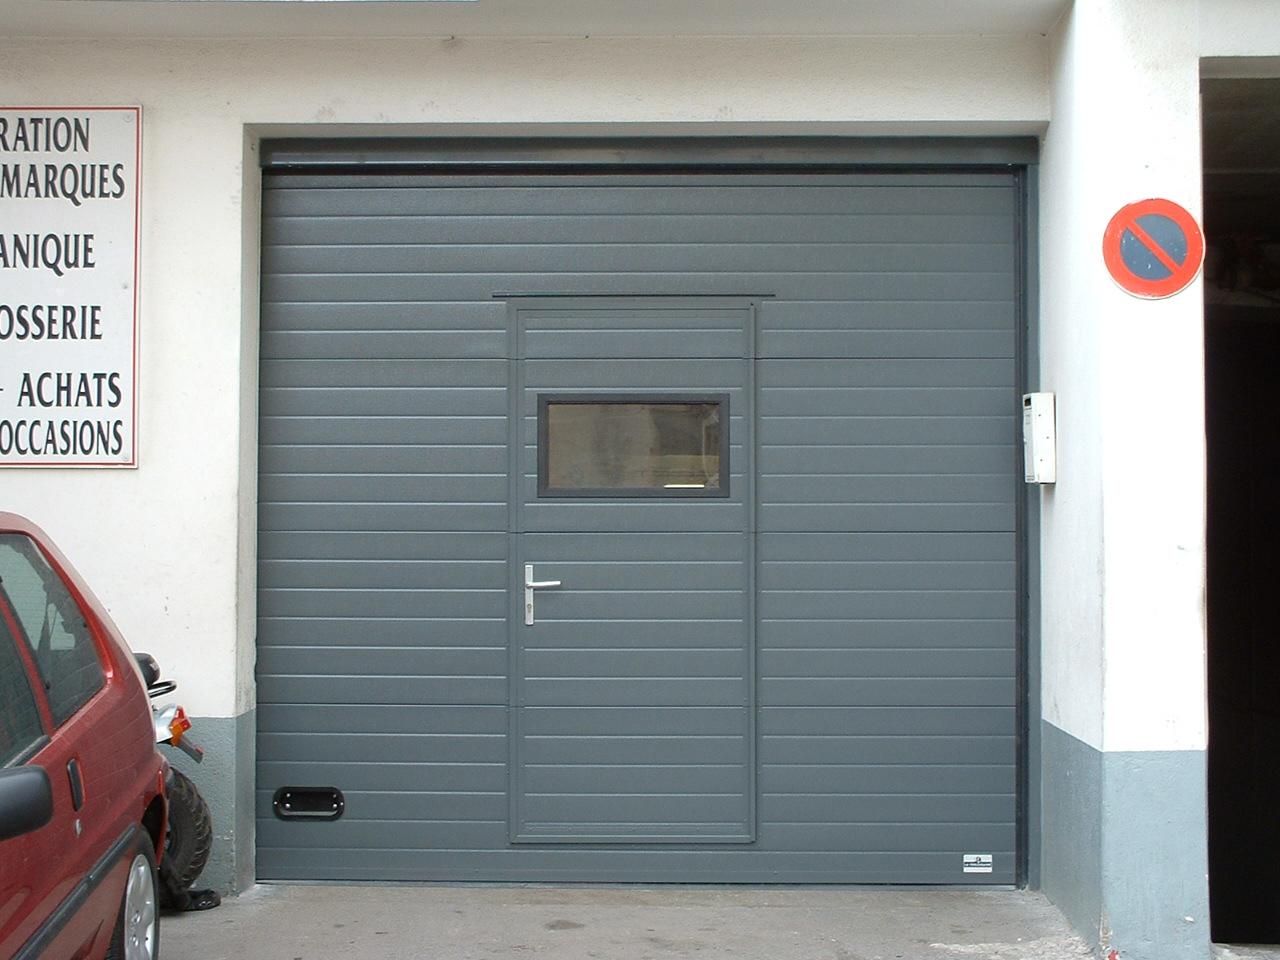 marquise de porte marquise porte sur enperdresonlapin. Black Bedroom Furniture Sets. Home Design Ideas